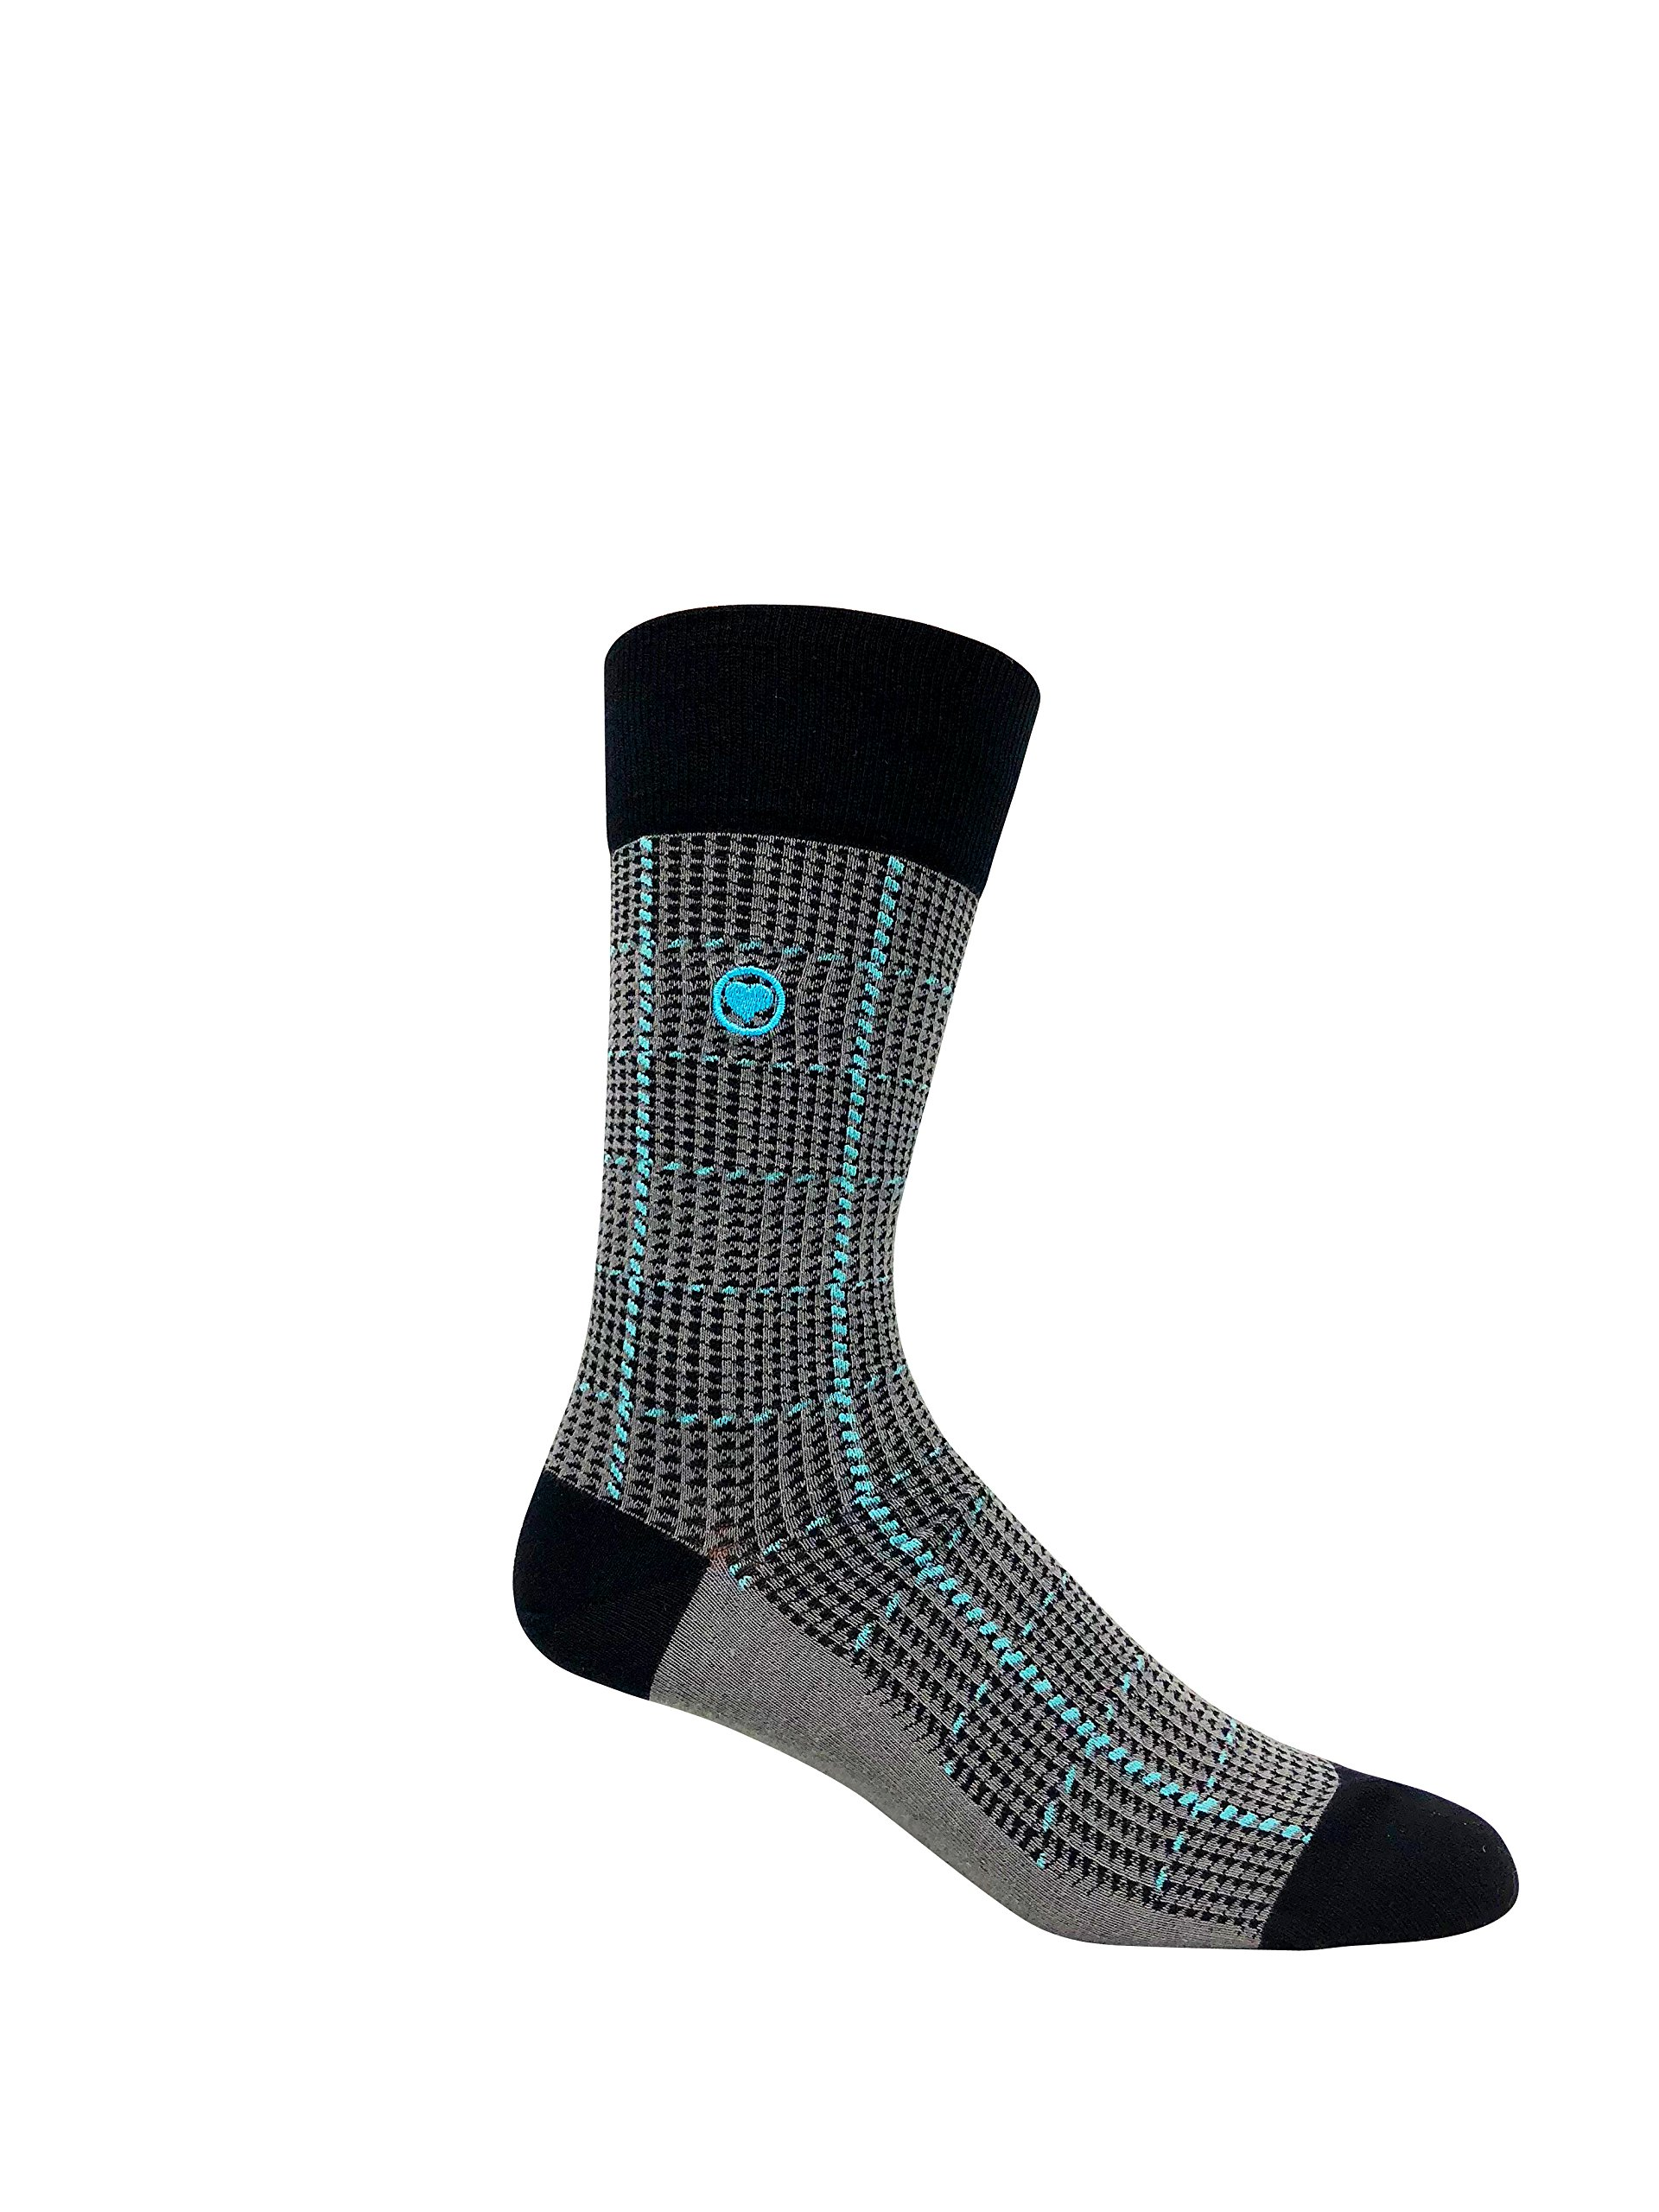 LOVE SOCK COMPANY Black Organic cotton men's dress socks bundle. 3 Premium black socks solid, polka dots and houndstooth patterned socks set by LOVE SOCK COMPANY (Image #5)